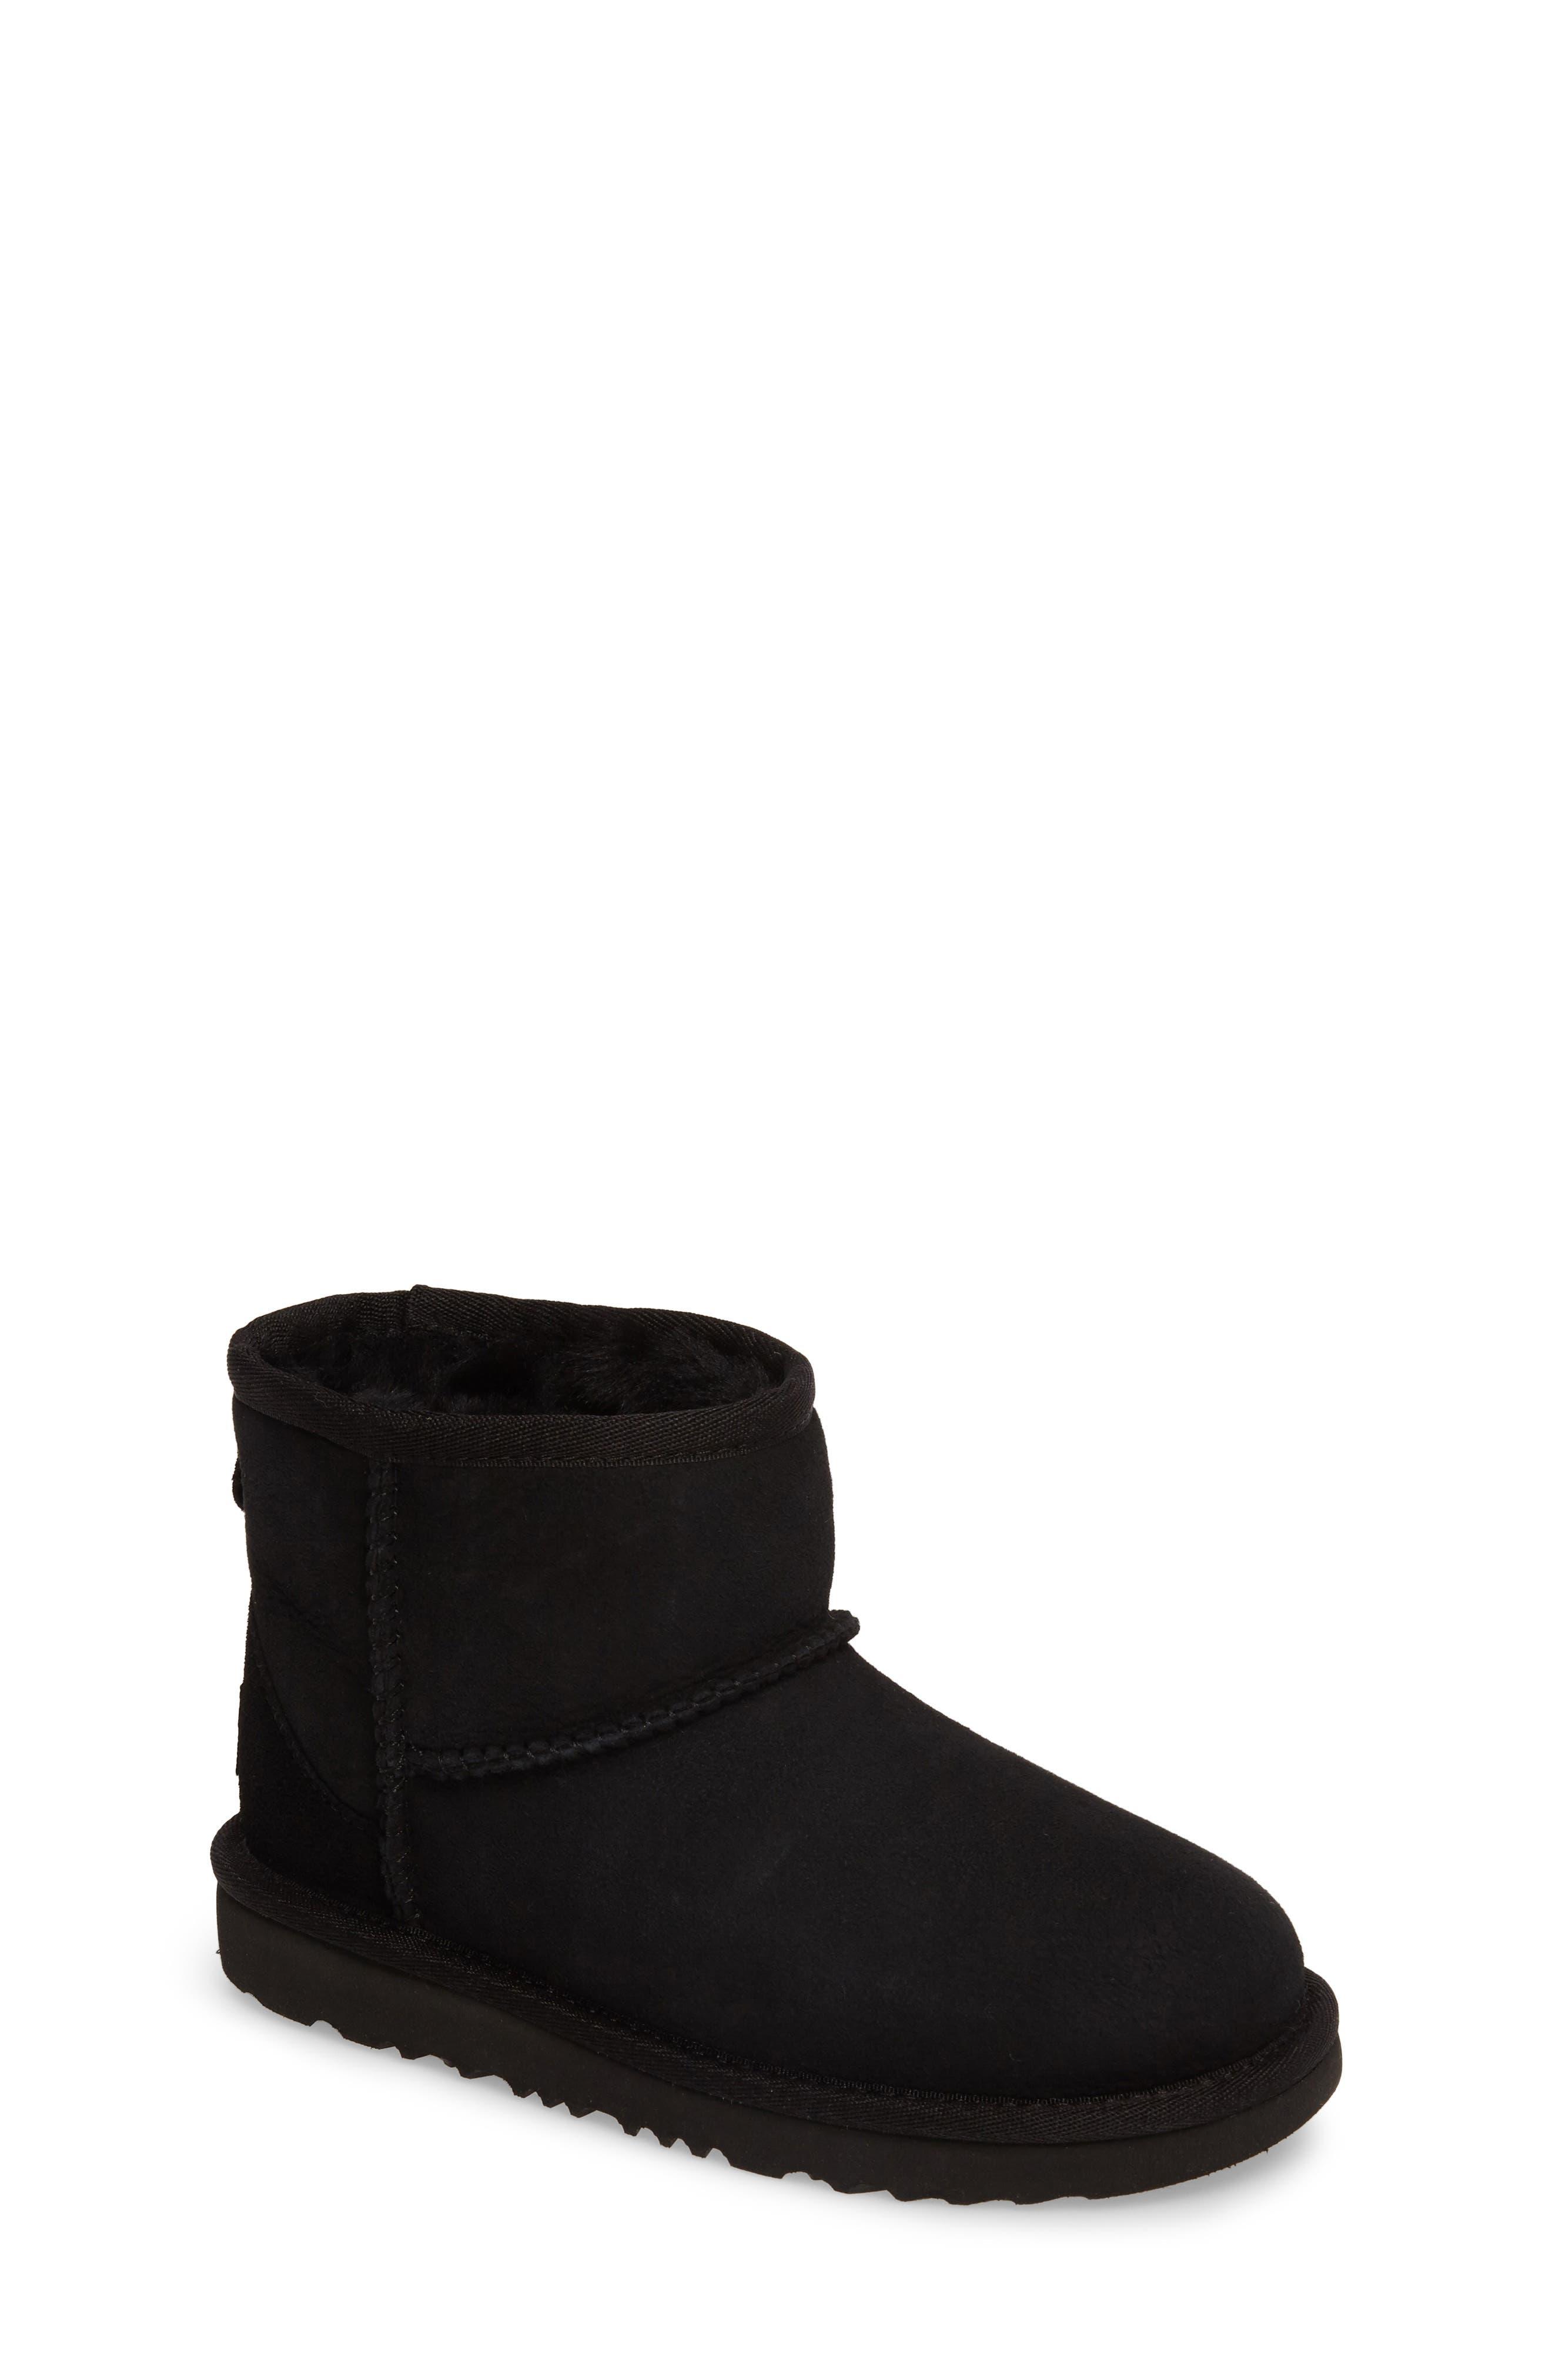 Main Image - UGG® Classic Mini II Water-Resistant Genuine Shearling Boot (Little Kid & Big Kid)